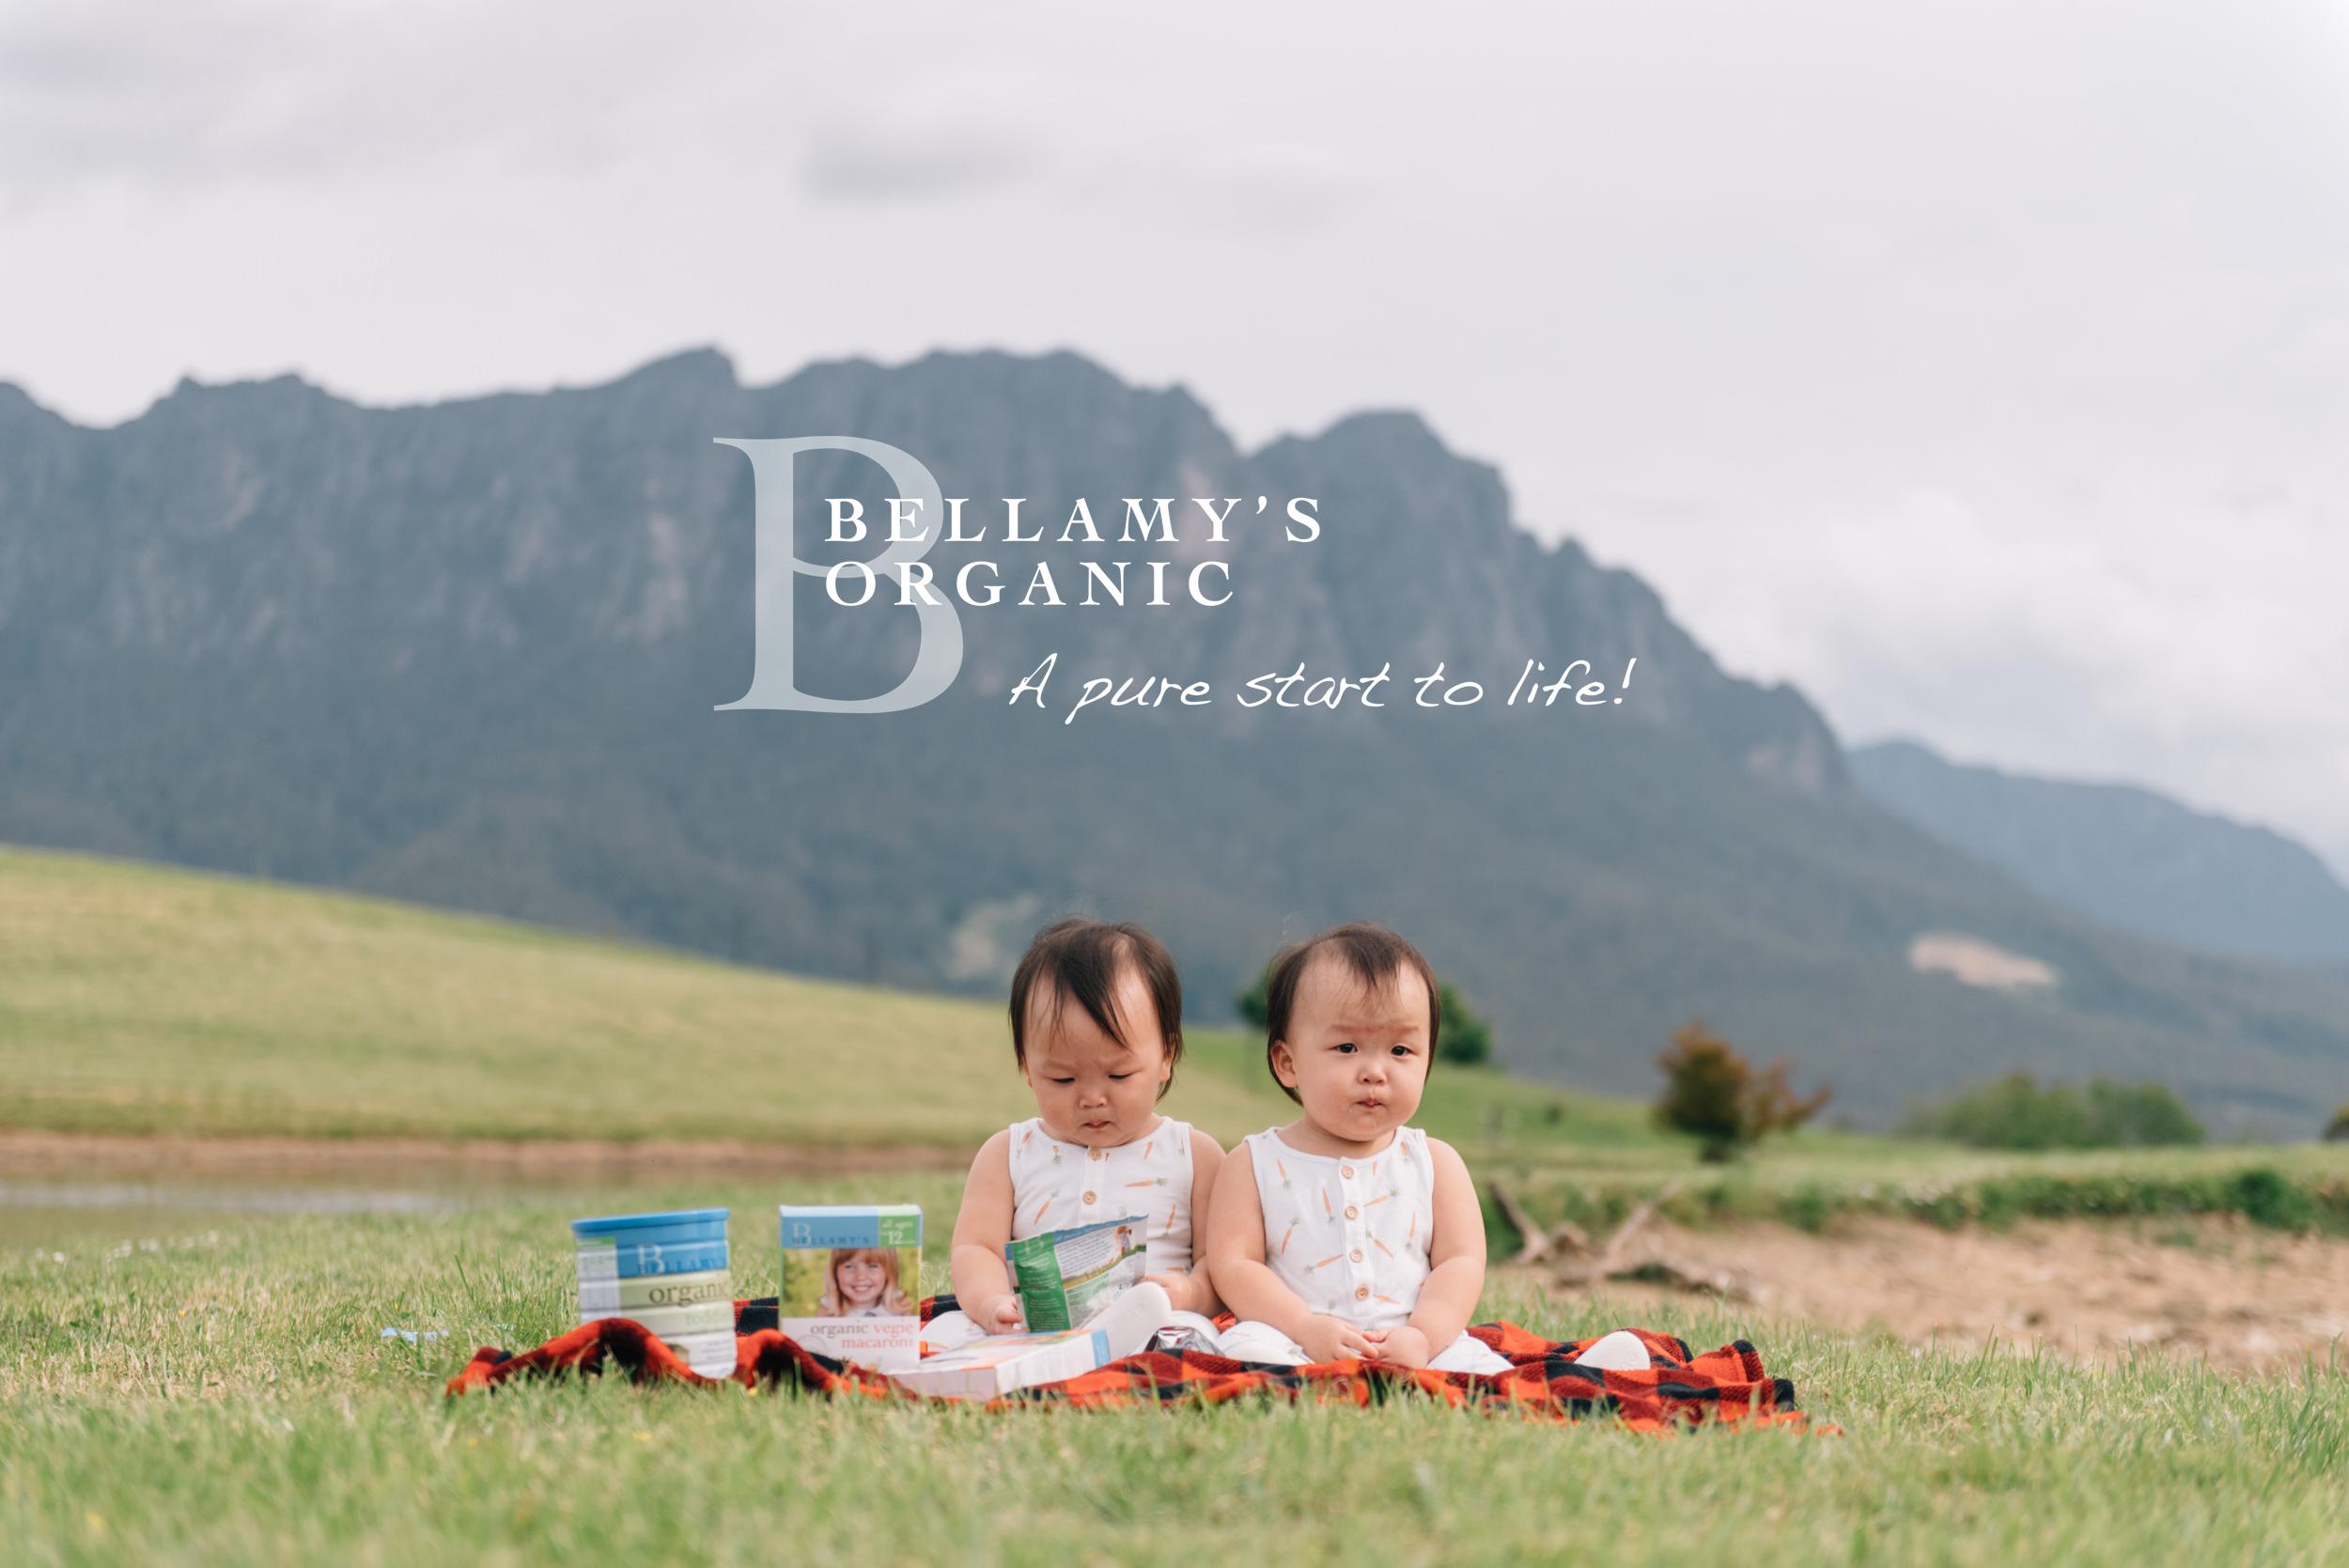 Bellamys-Corporate-Photography-Tasmania-35.jpg